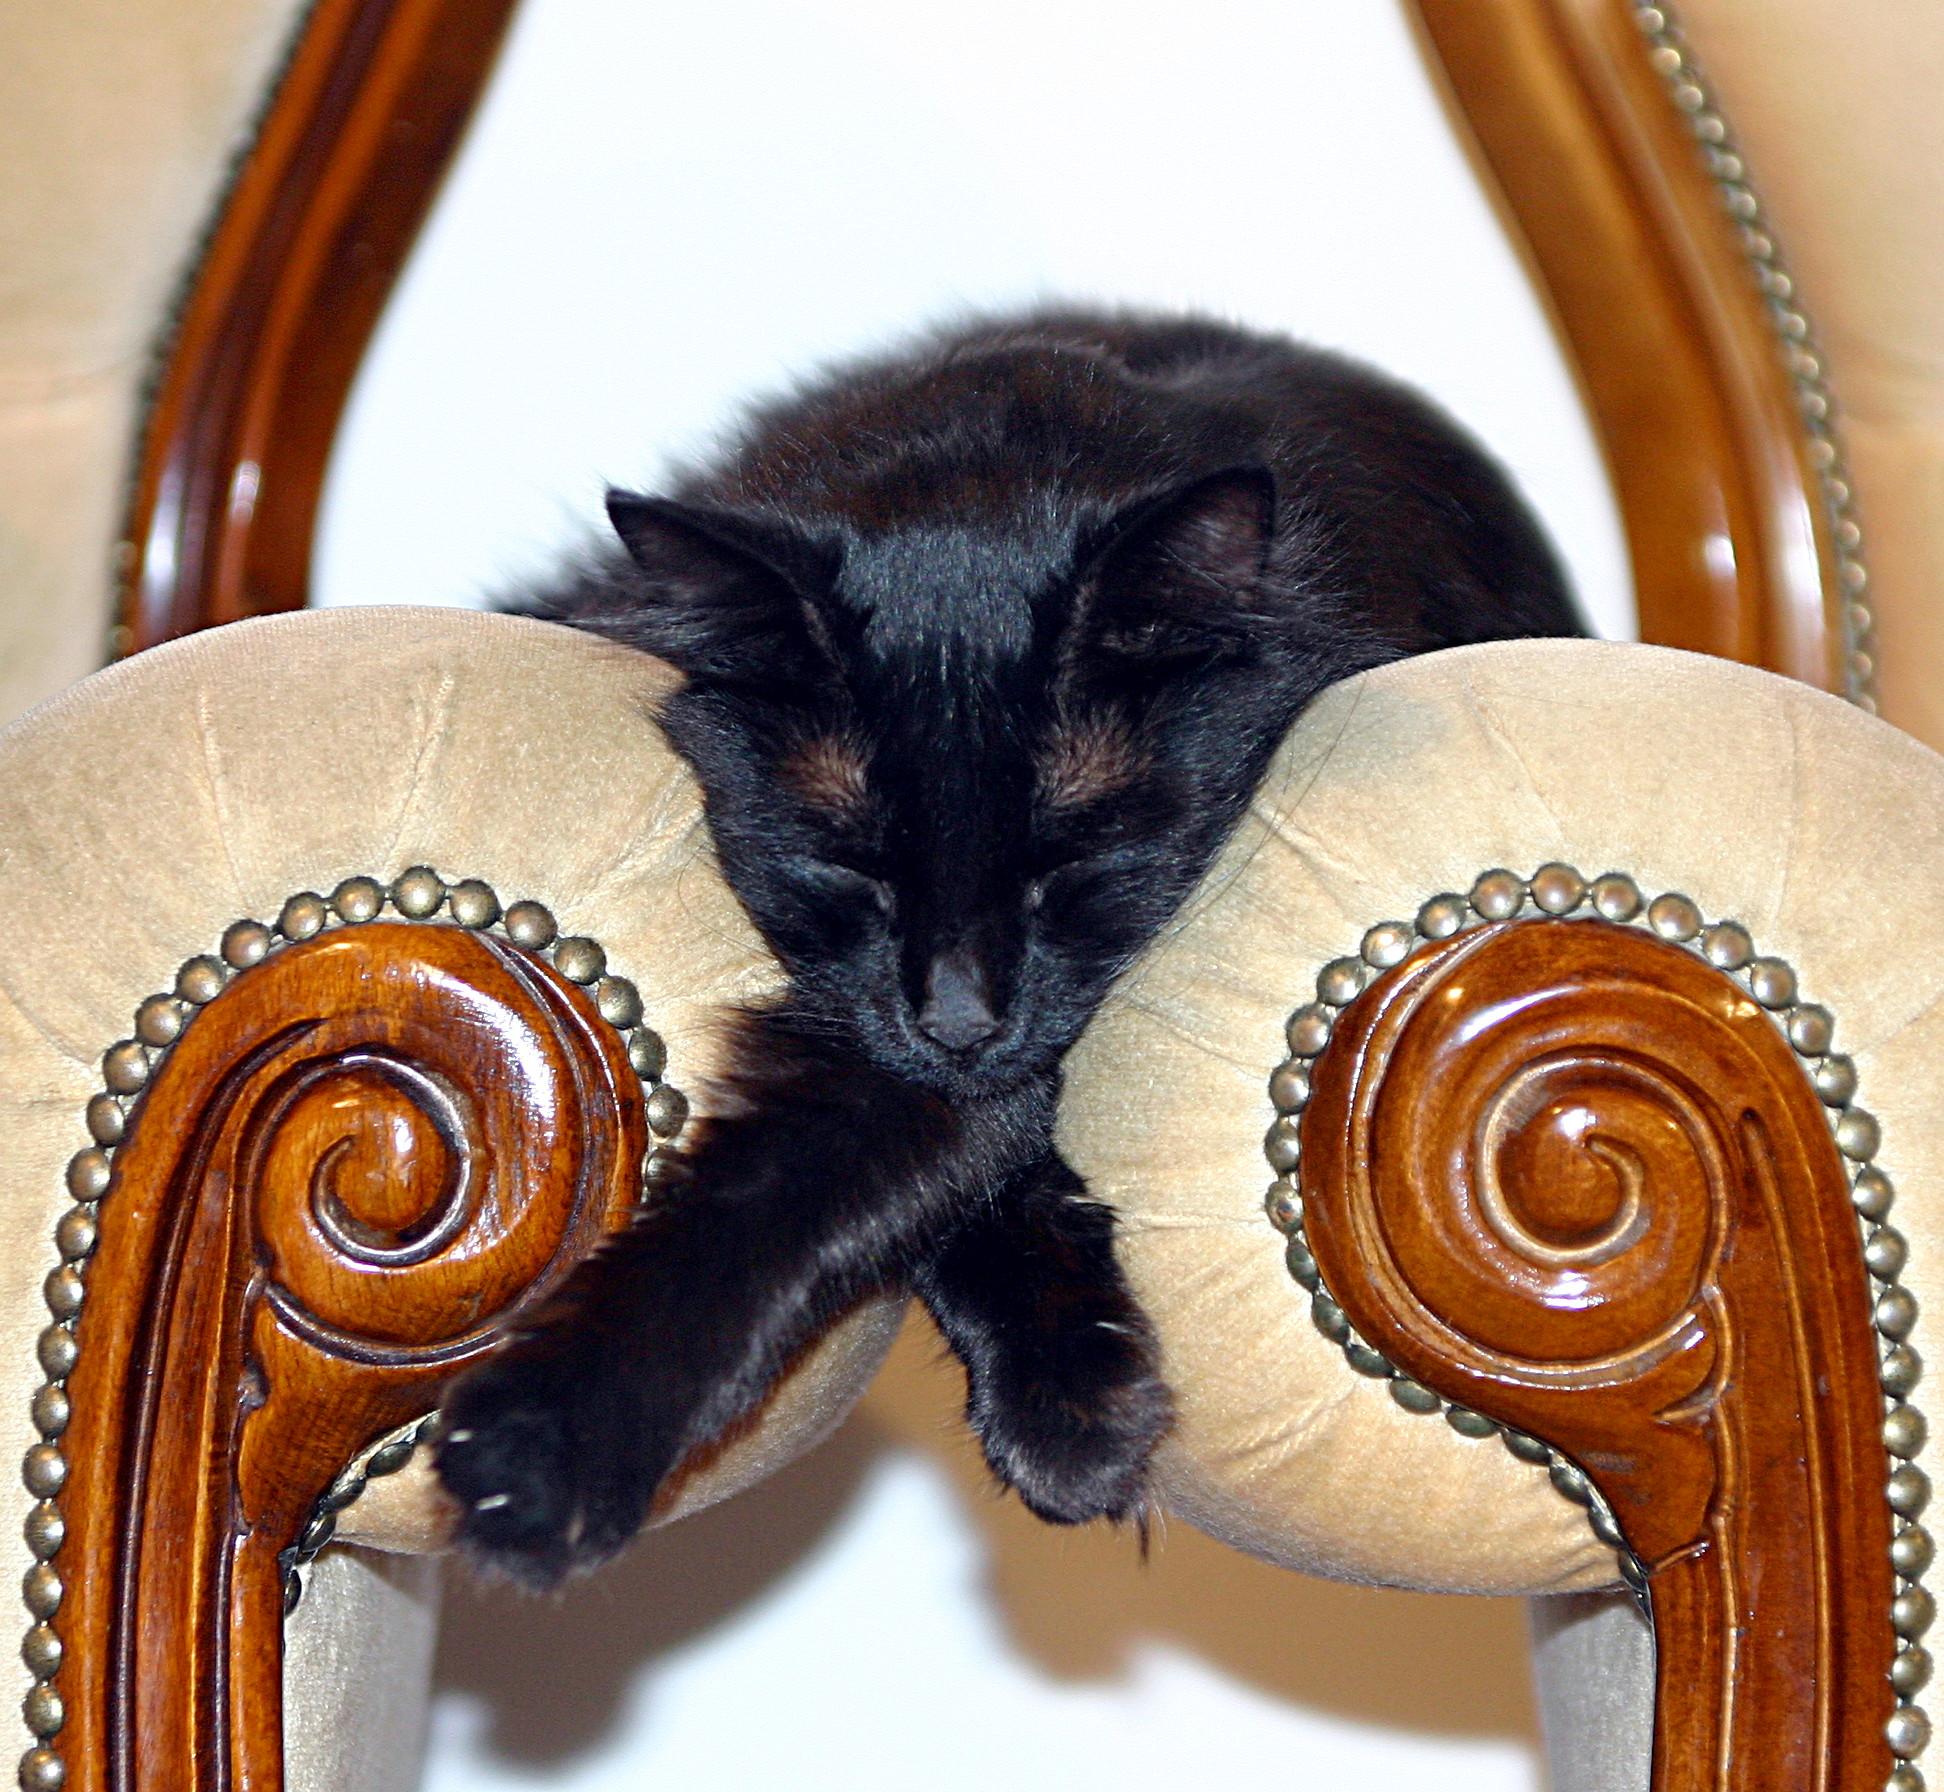 Sleeping between armchairs